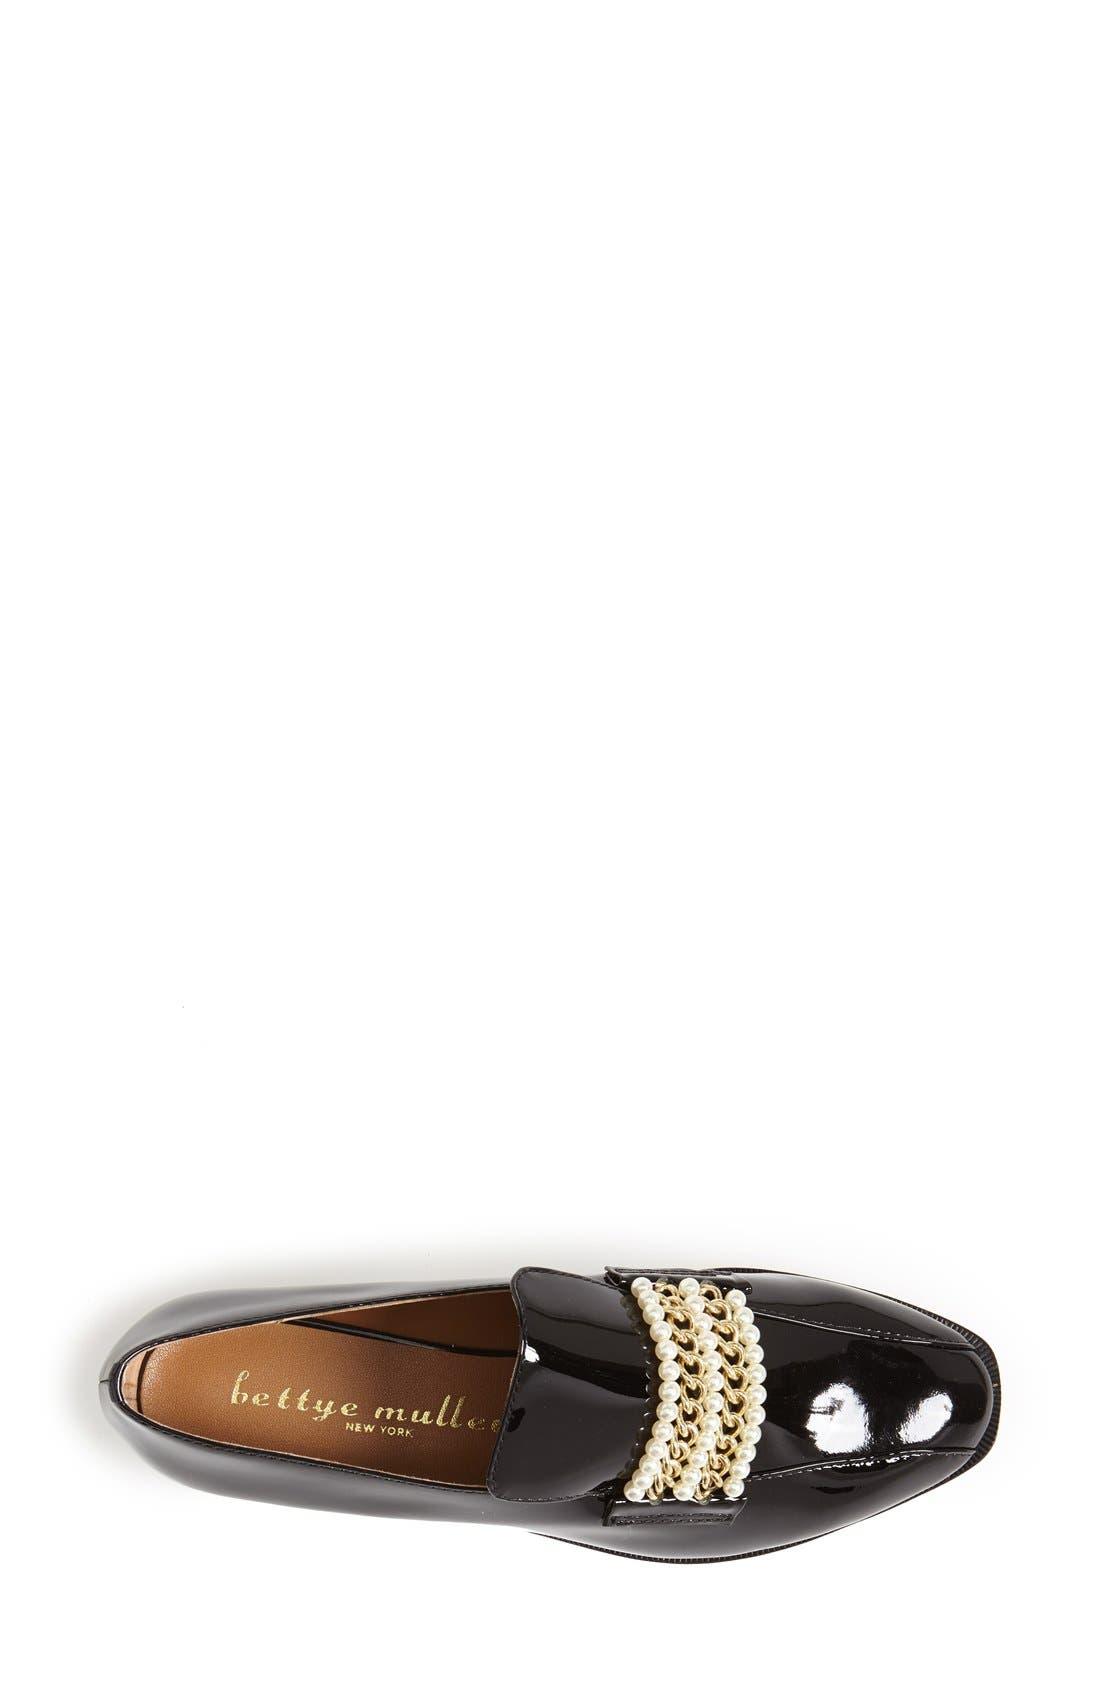 Alternate Image 3  - Bettye Muller 'Pearl' Patent Leather Loafer (Women)